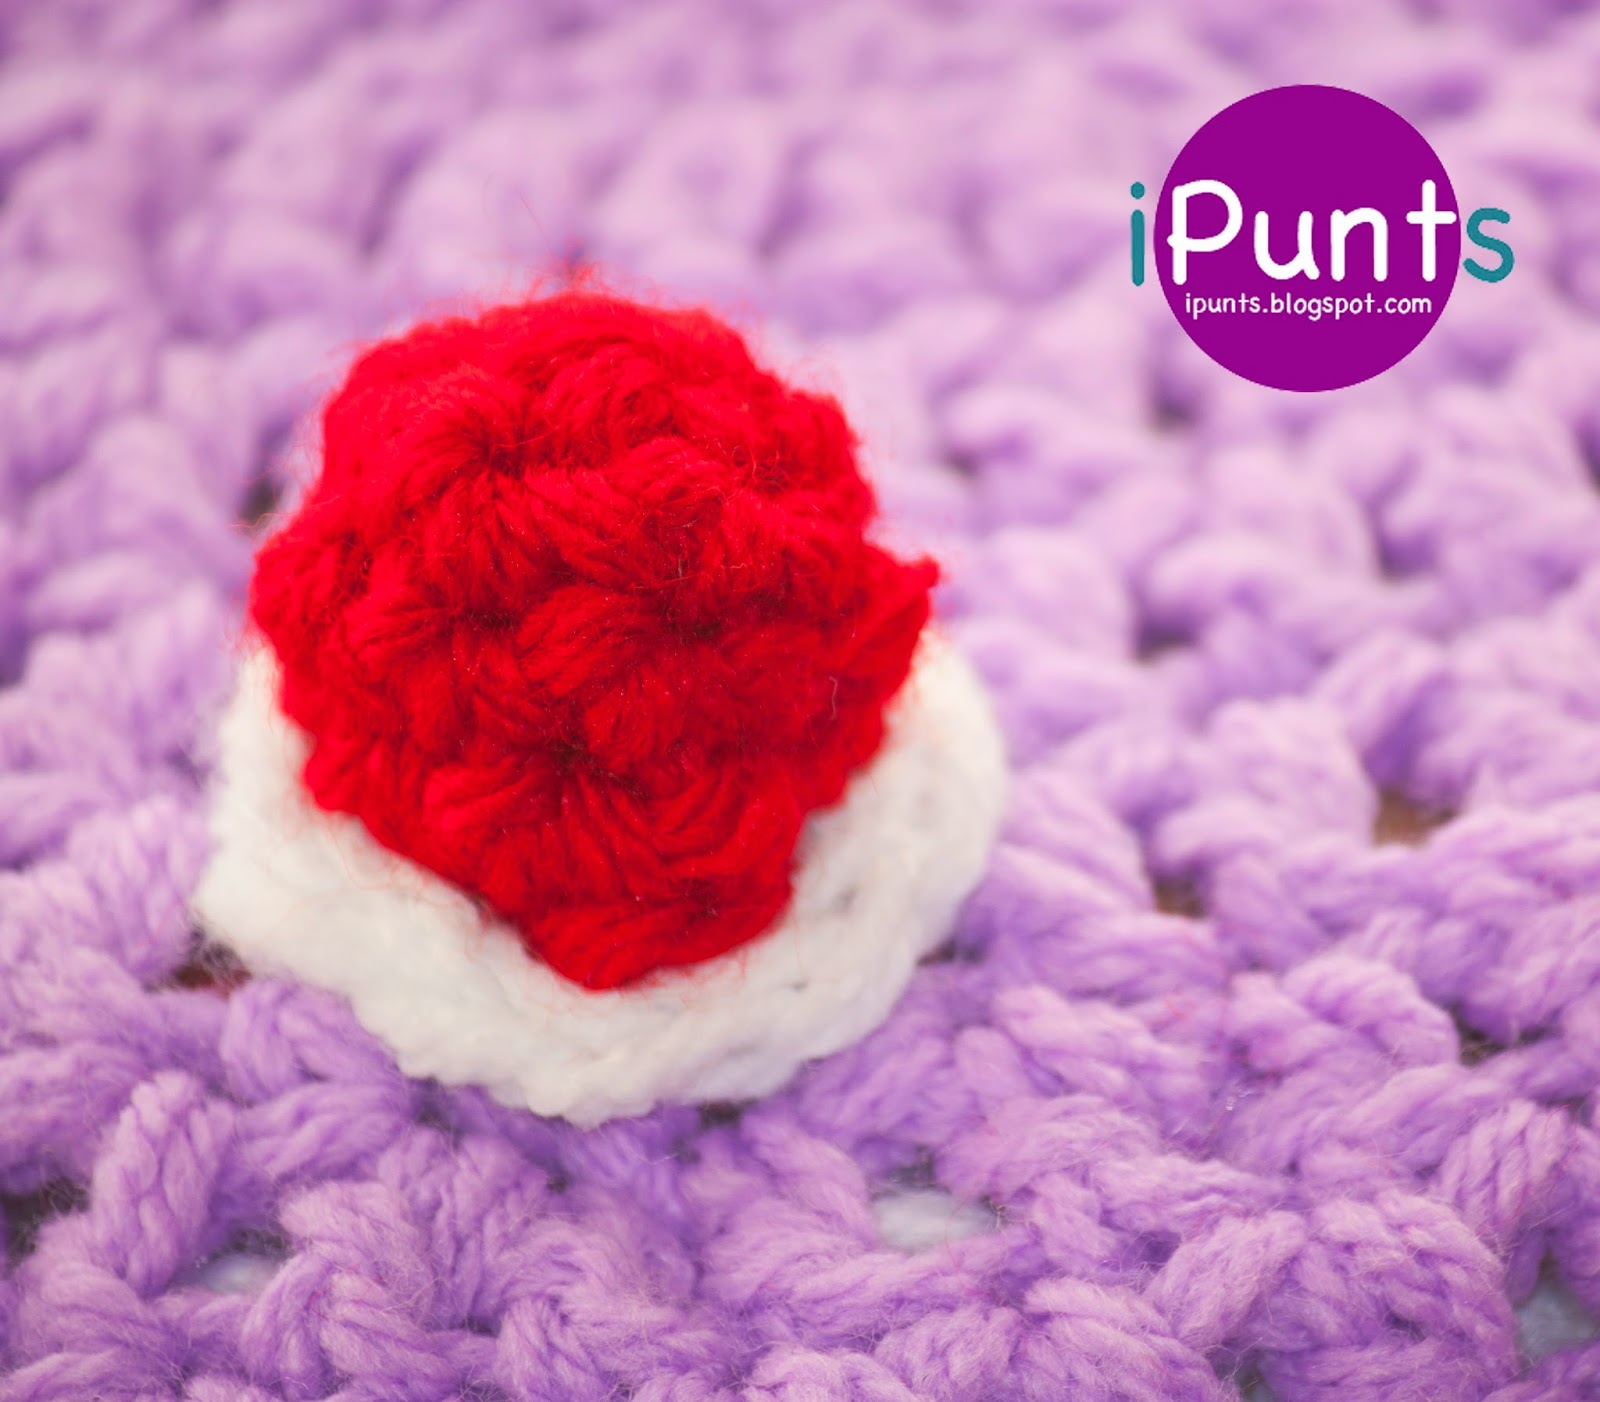 ipunts patron gratis tarta pastel cumpleaños happy birthday ganchillo crochet amigurumi